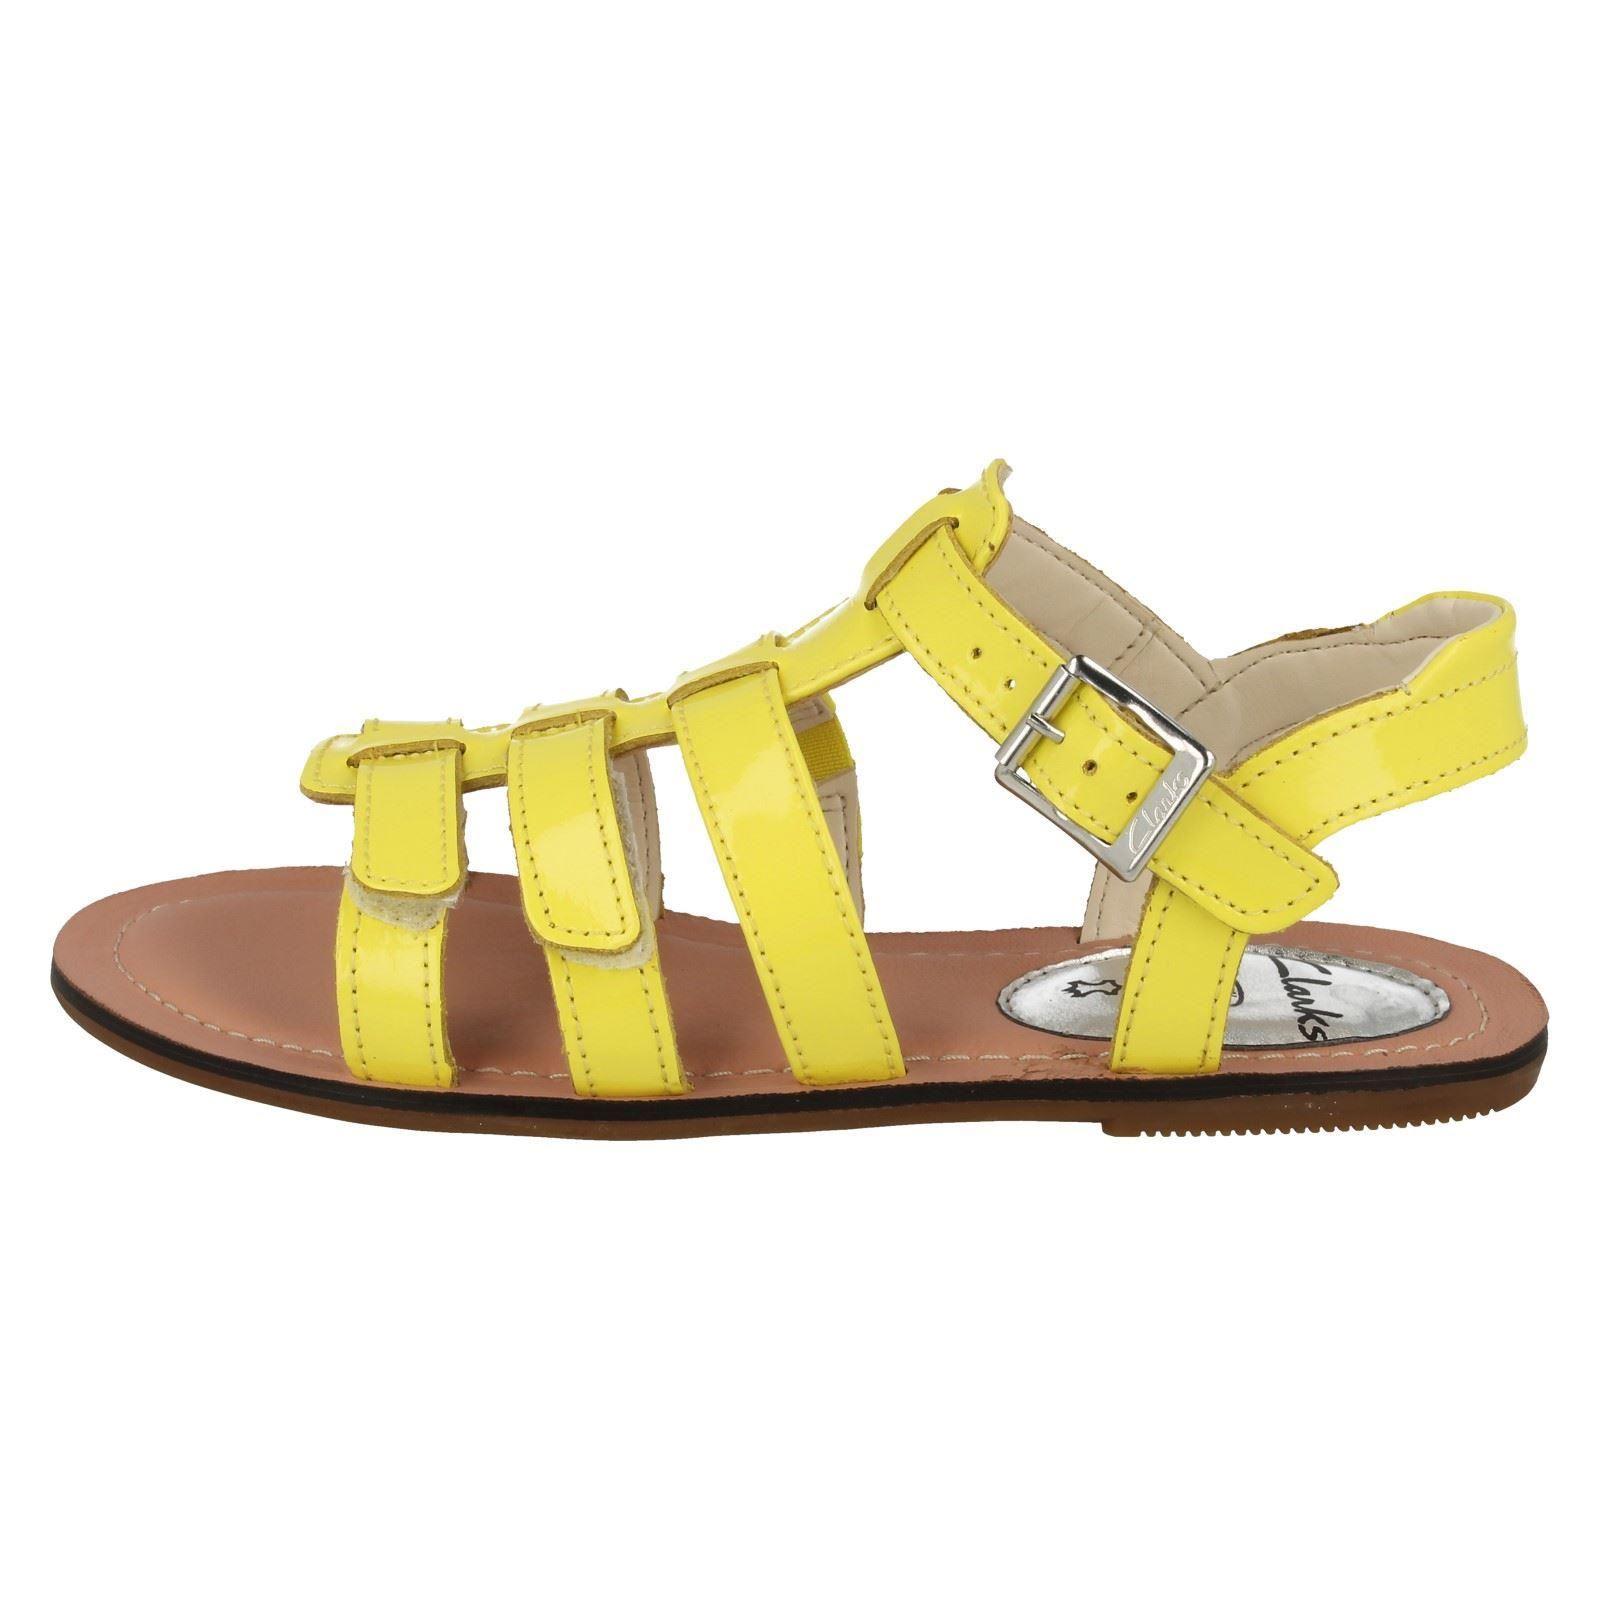 b7c577110eb Girls Clarks Flat Summer Gladiator Sandals